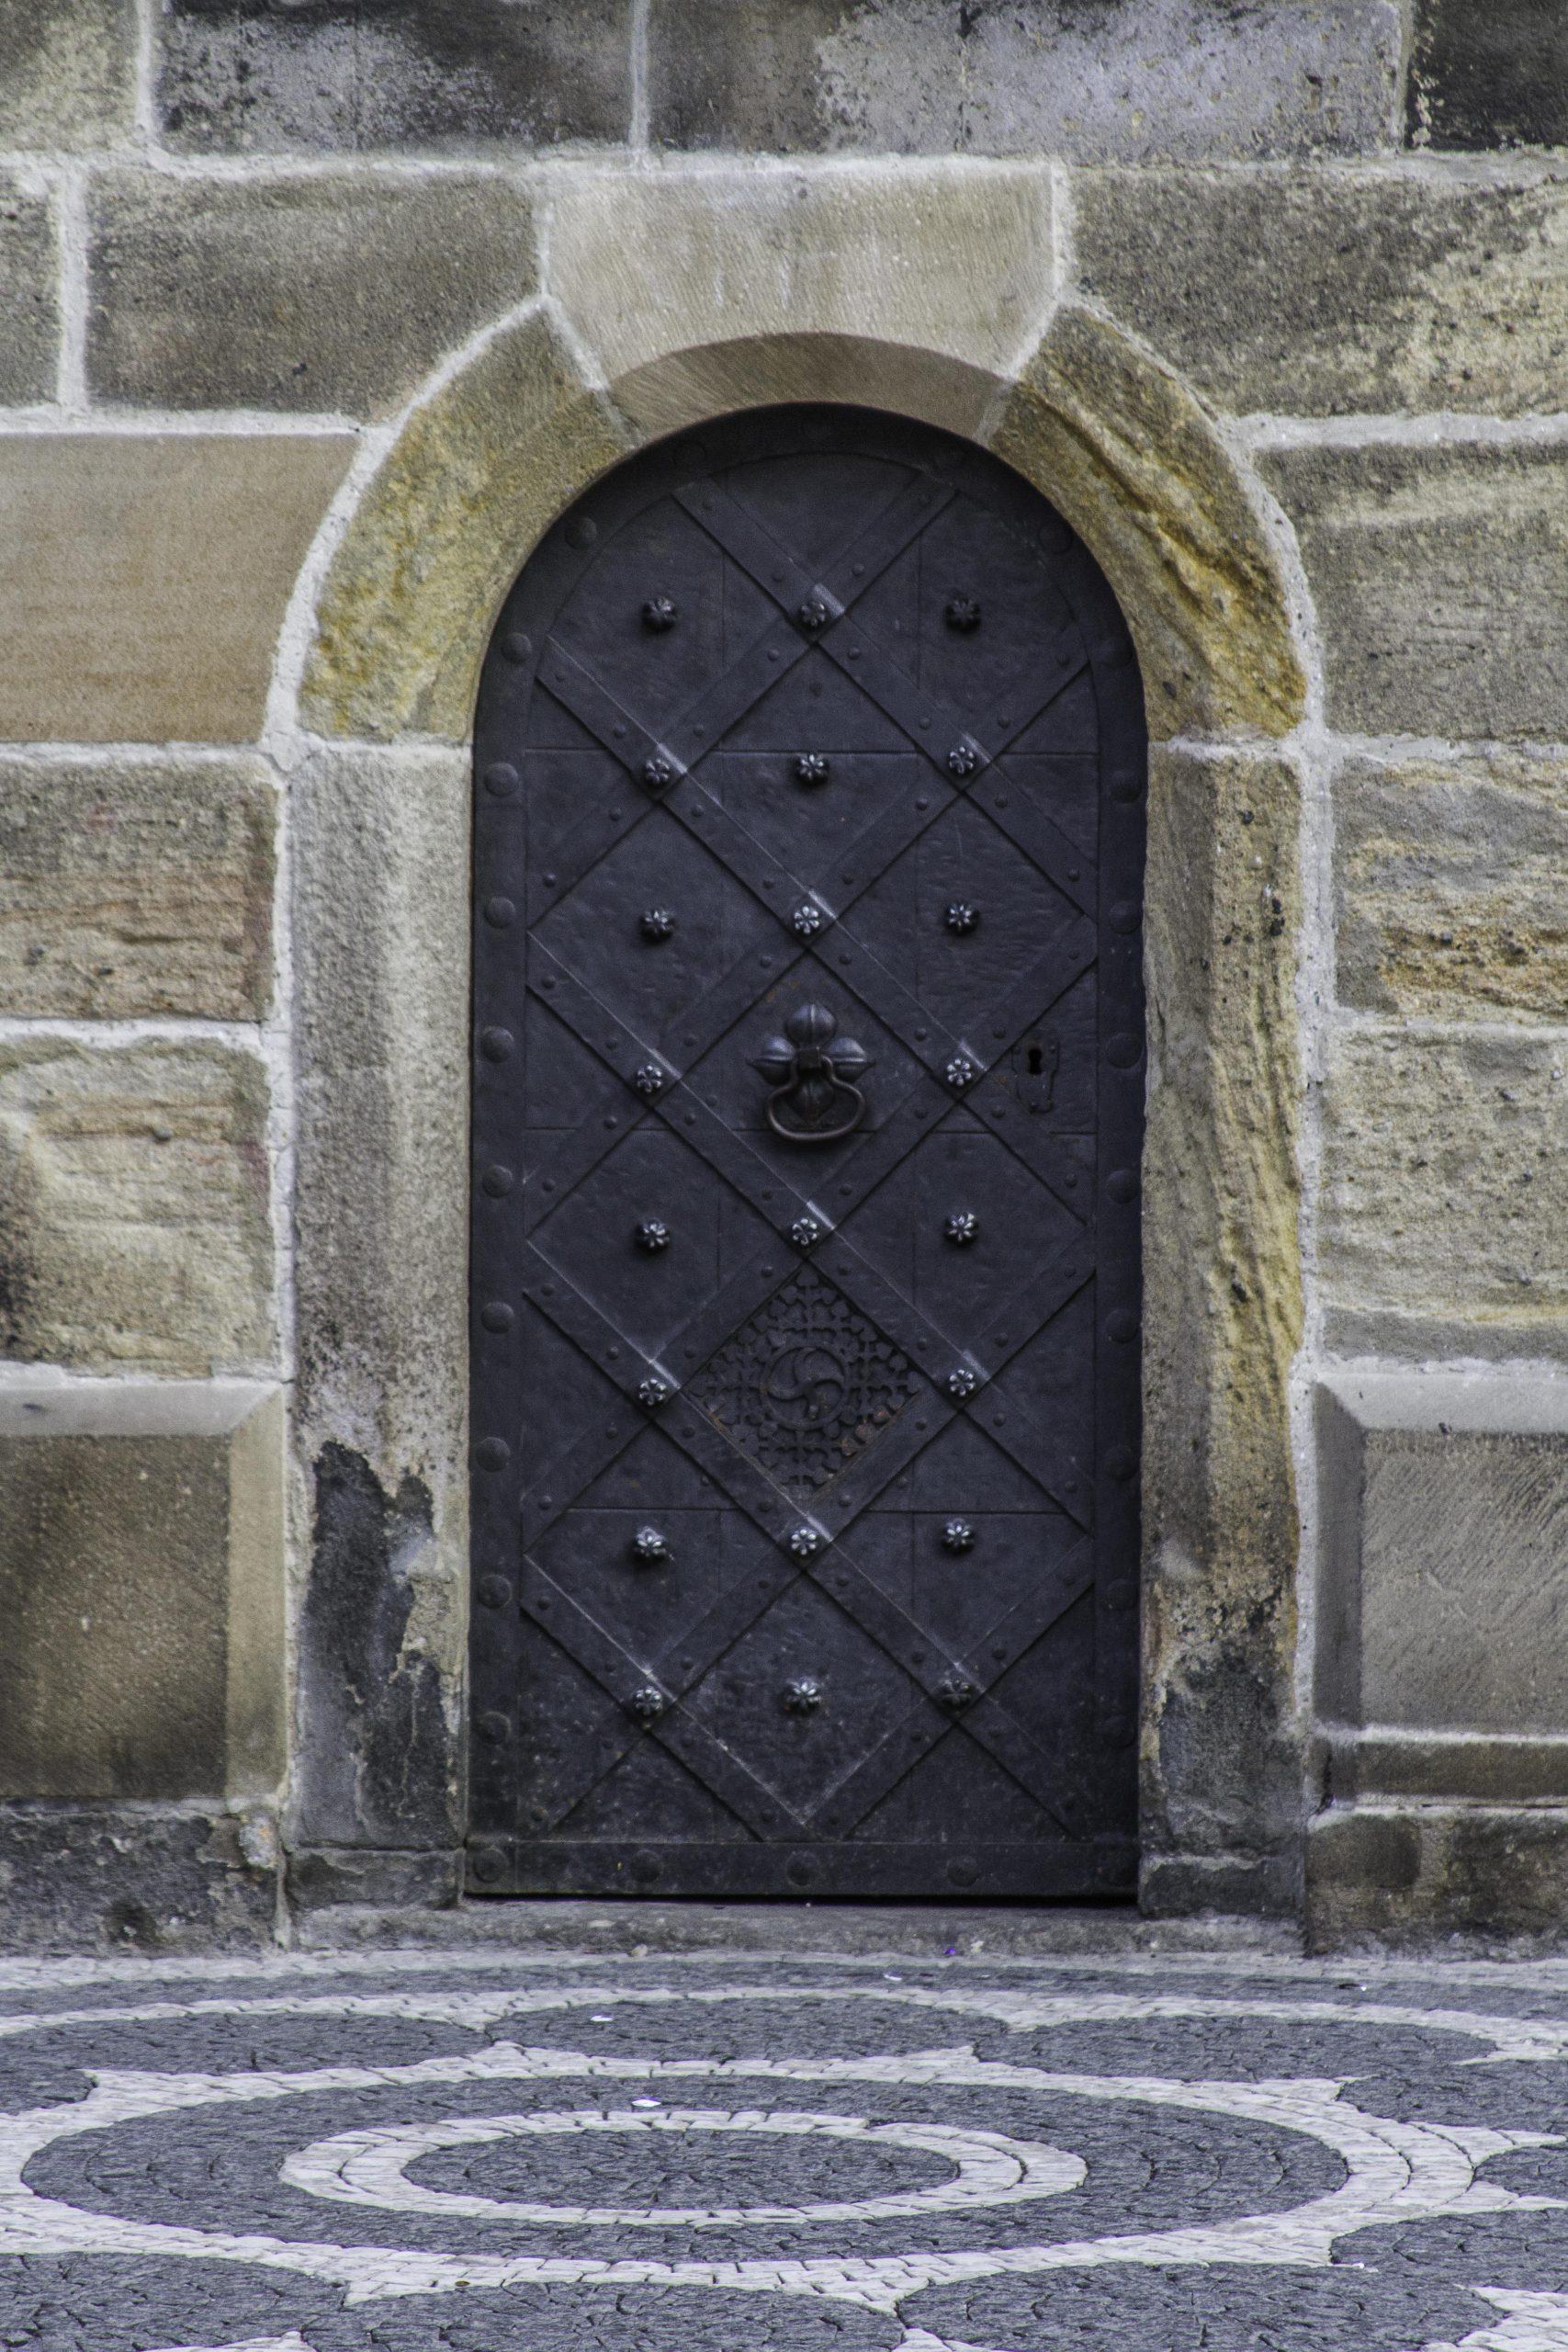 Spiritual but religious because the door can still open.